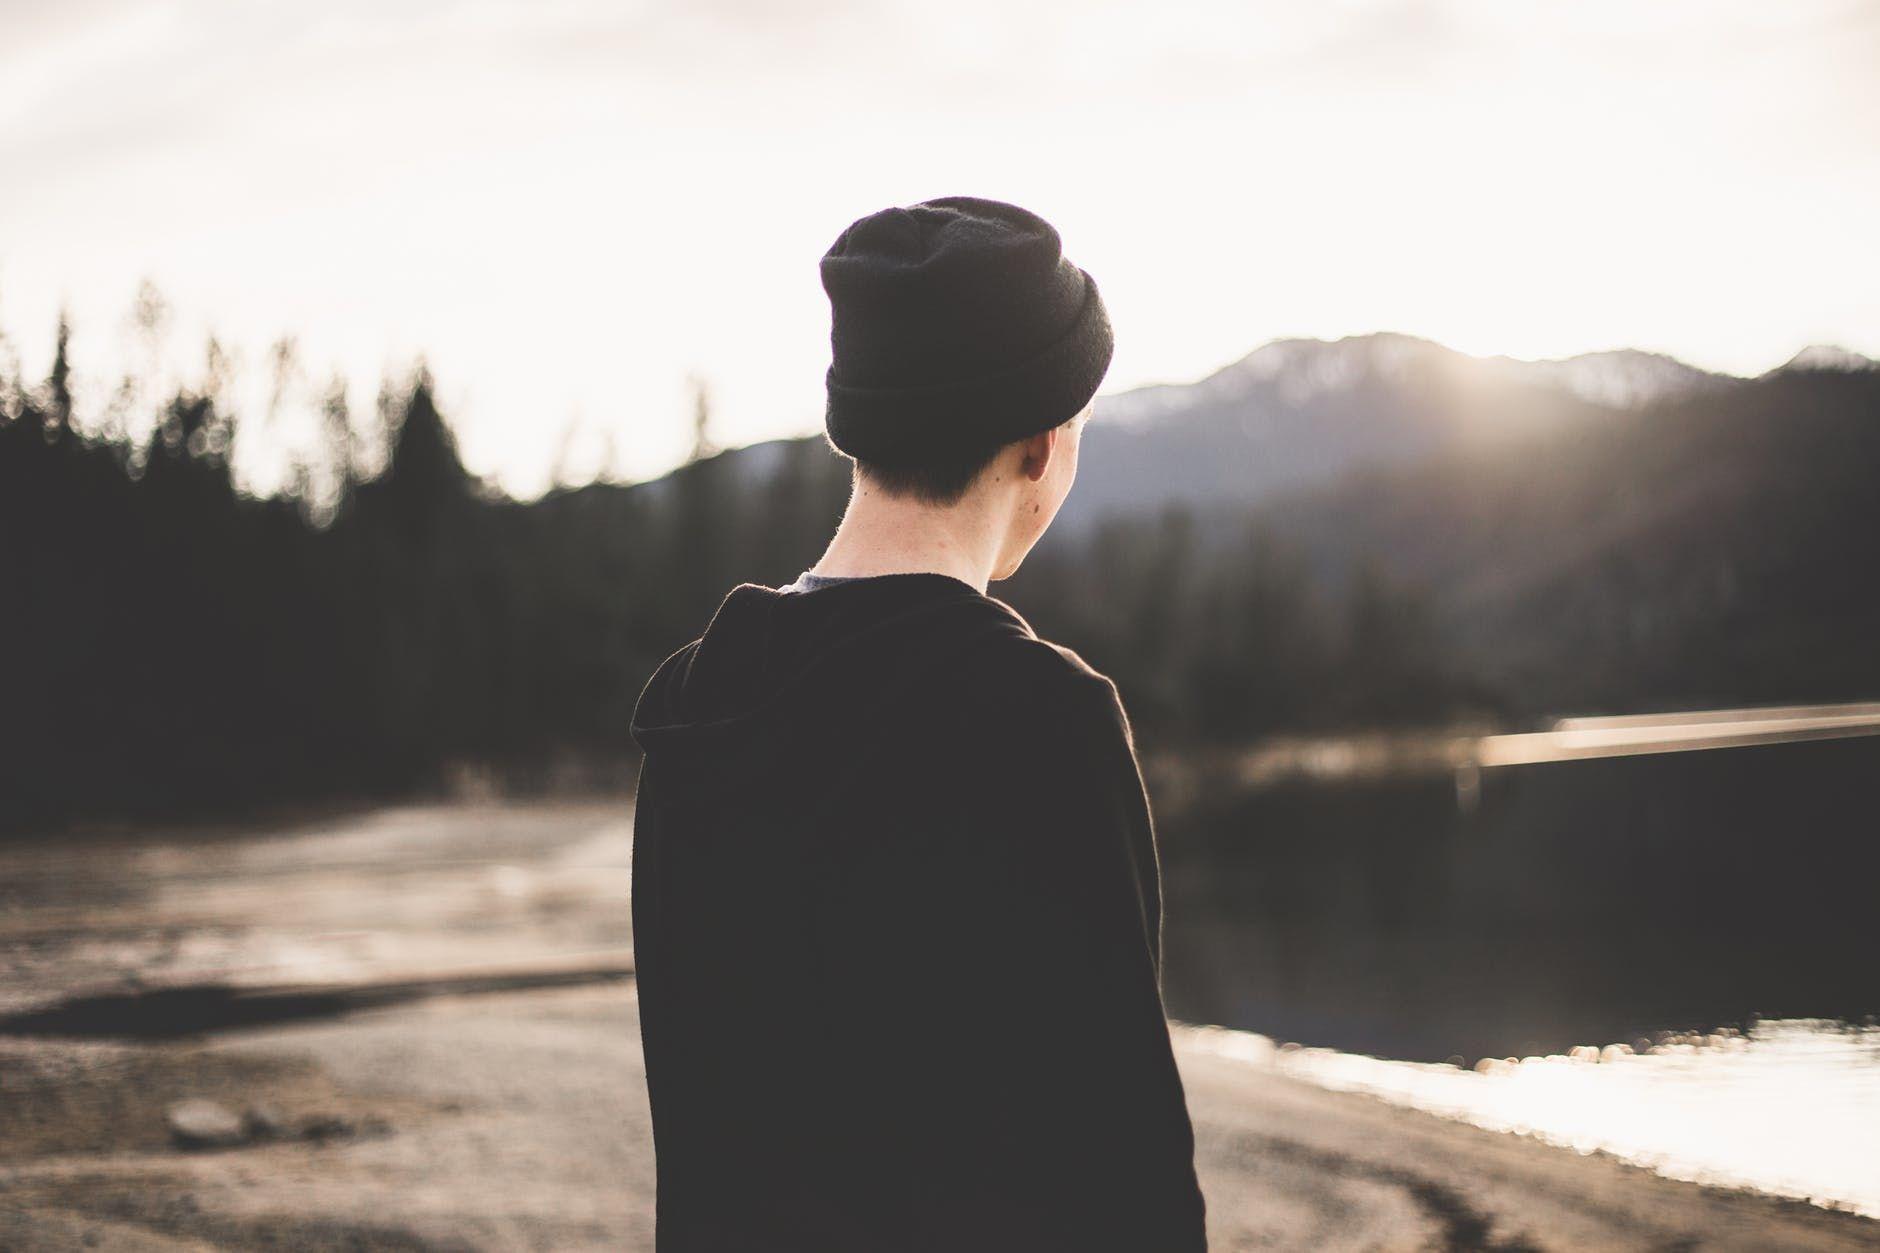 Kata-Kata Buat Mantan Biar Dia Merasa Menyesal